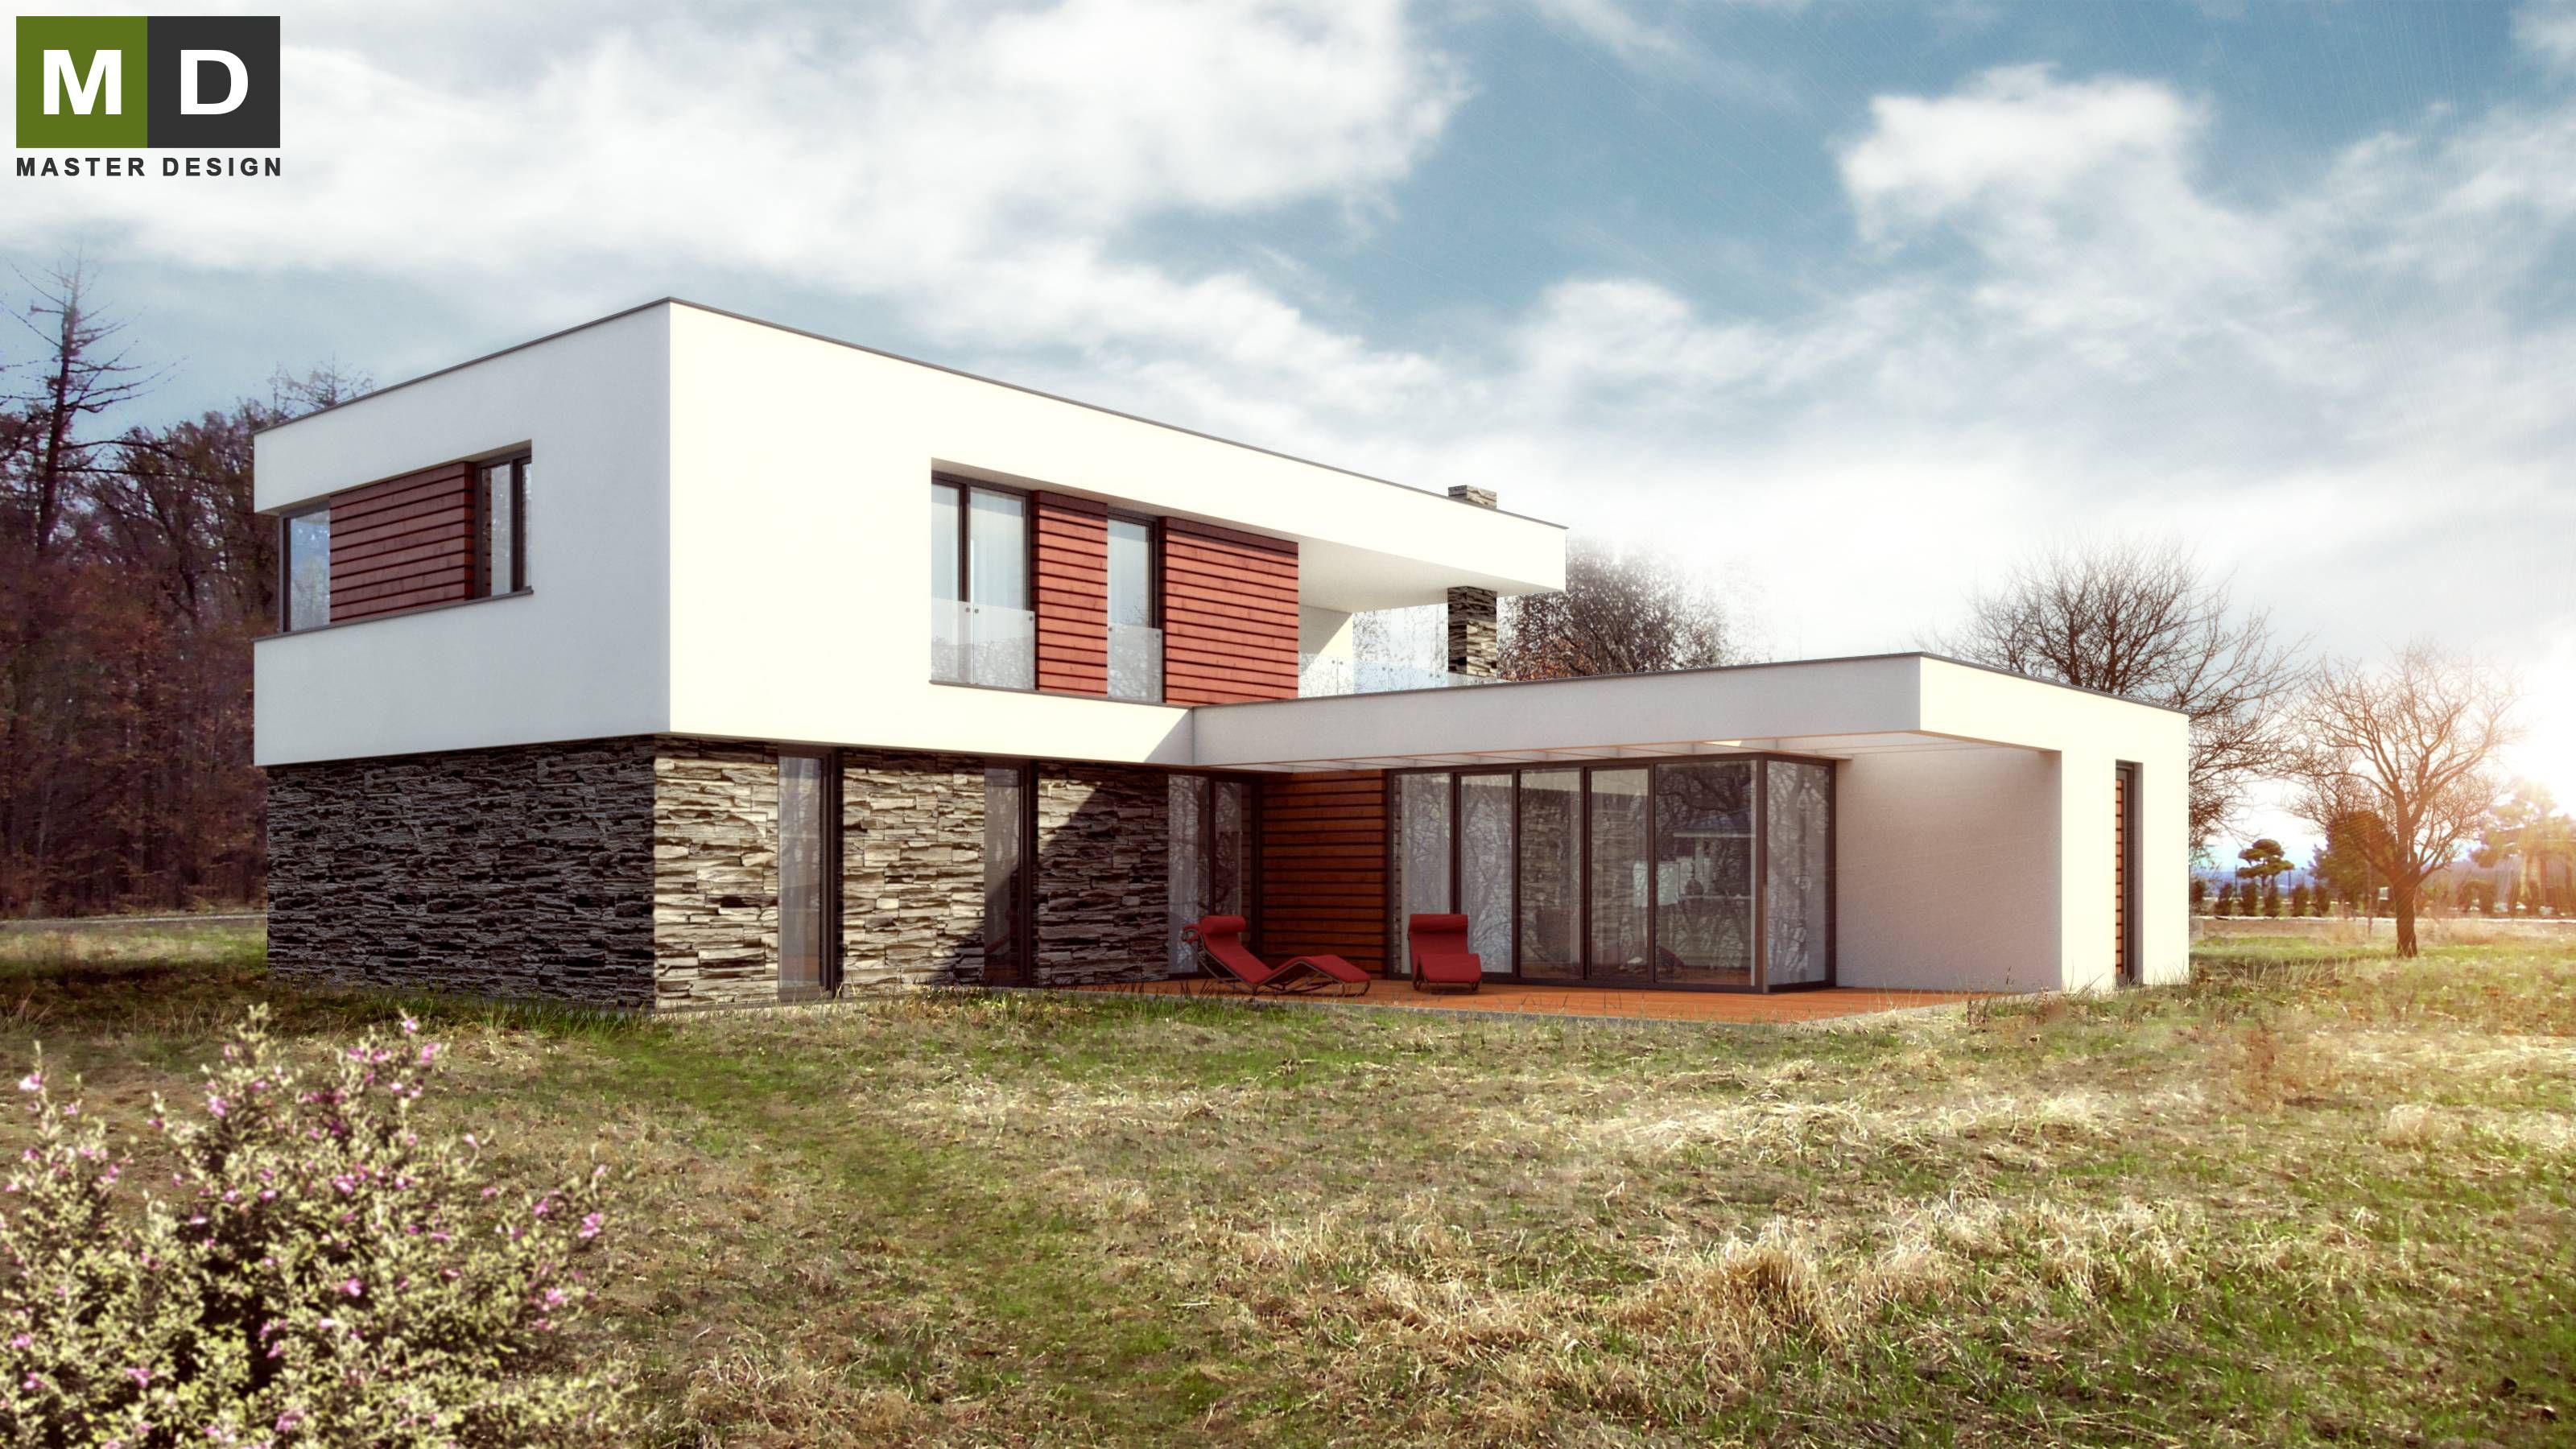 Amazing Home Design Zlín Part - 4: ... Luxury Low Energy House With A Flat Roof - Zlín - Vizualizace 1 ...